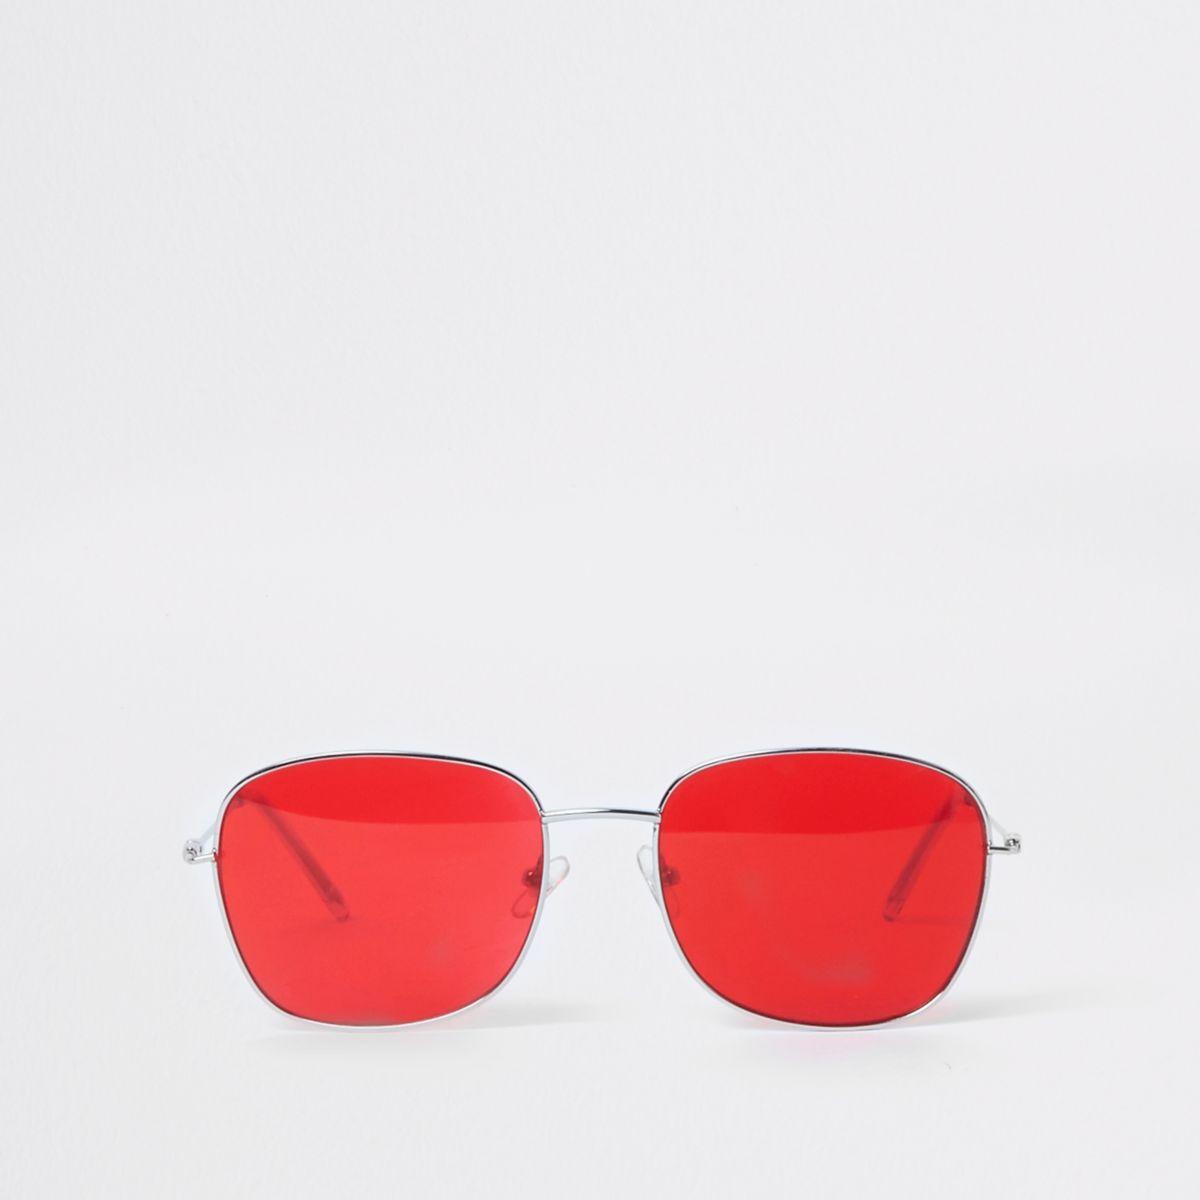 Silver tone square red lens sunglasses